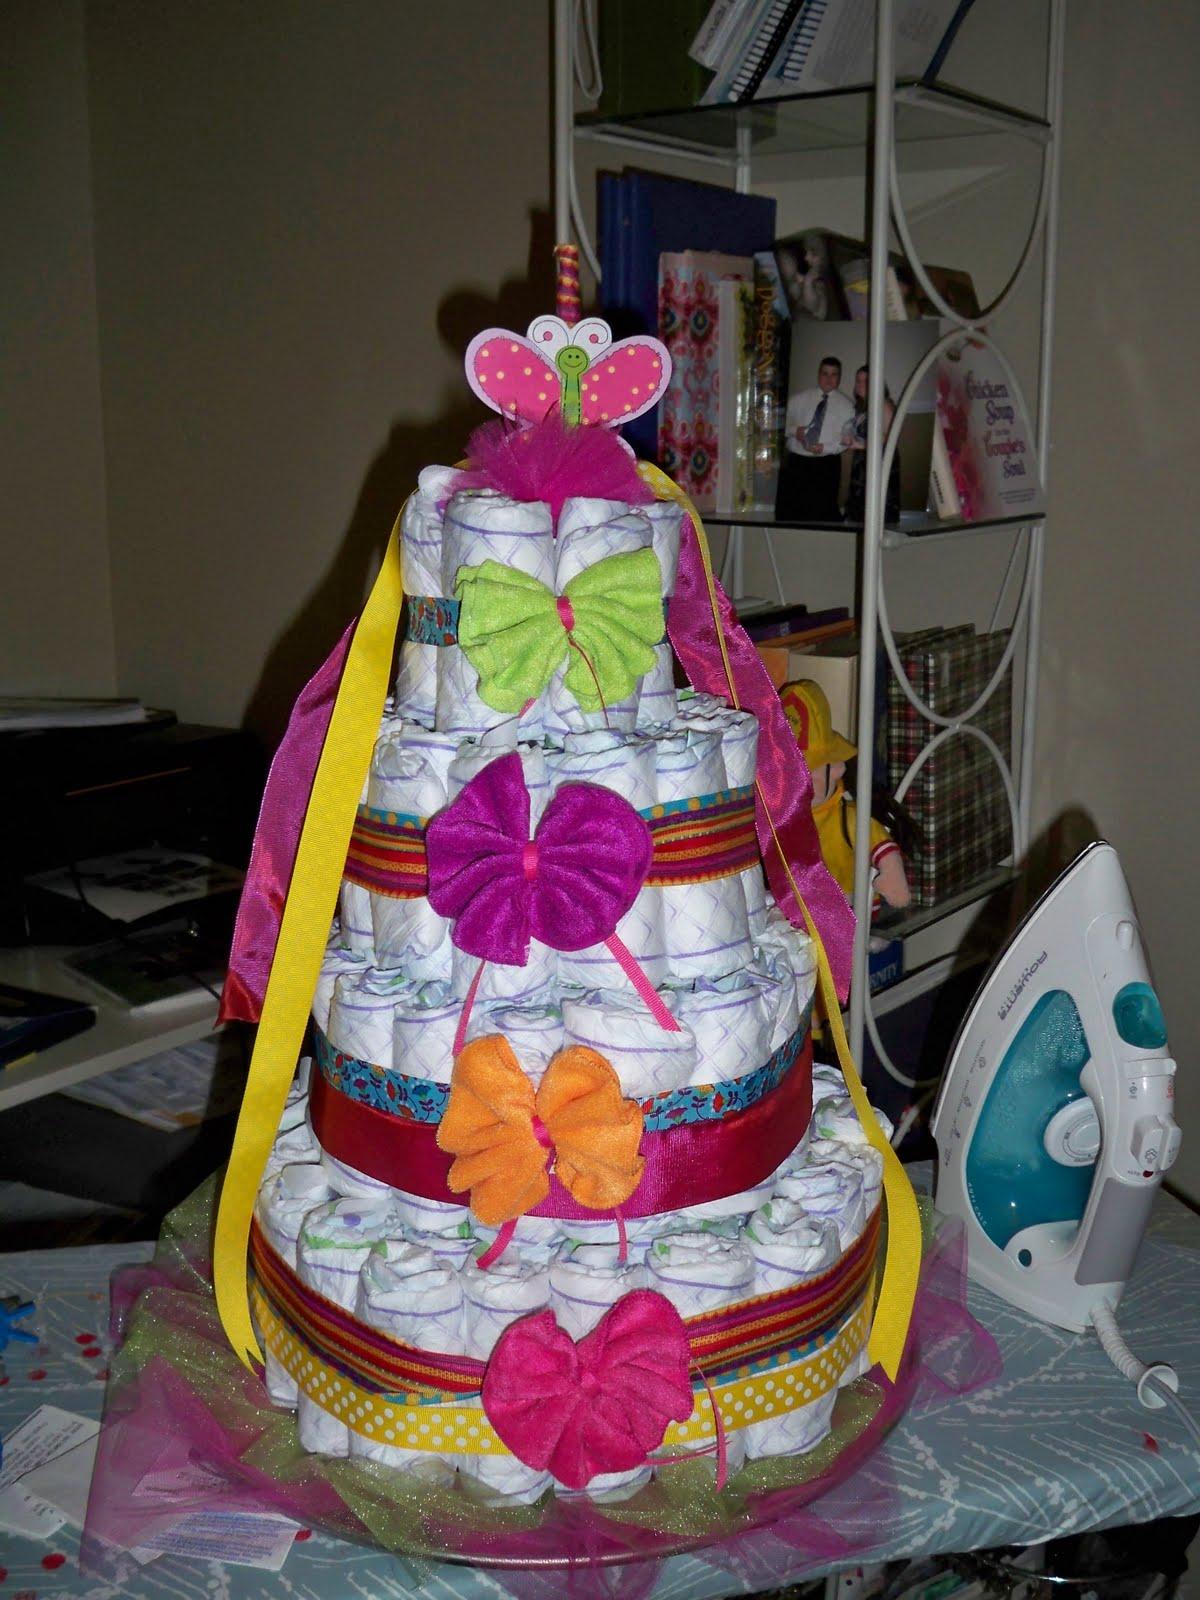 Rosenbergh Fam: Diaper cake supplies